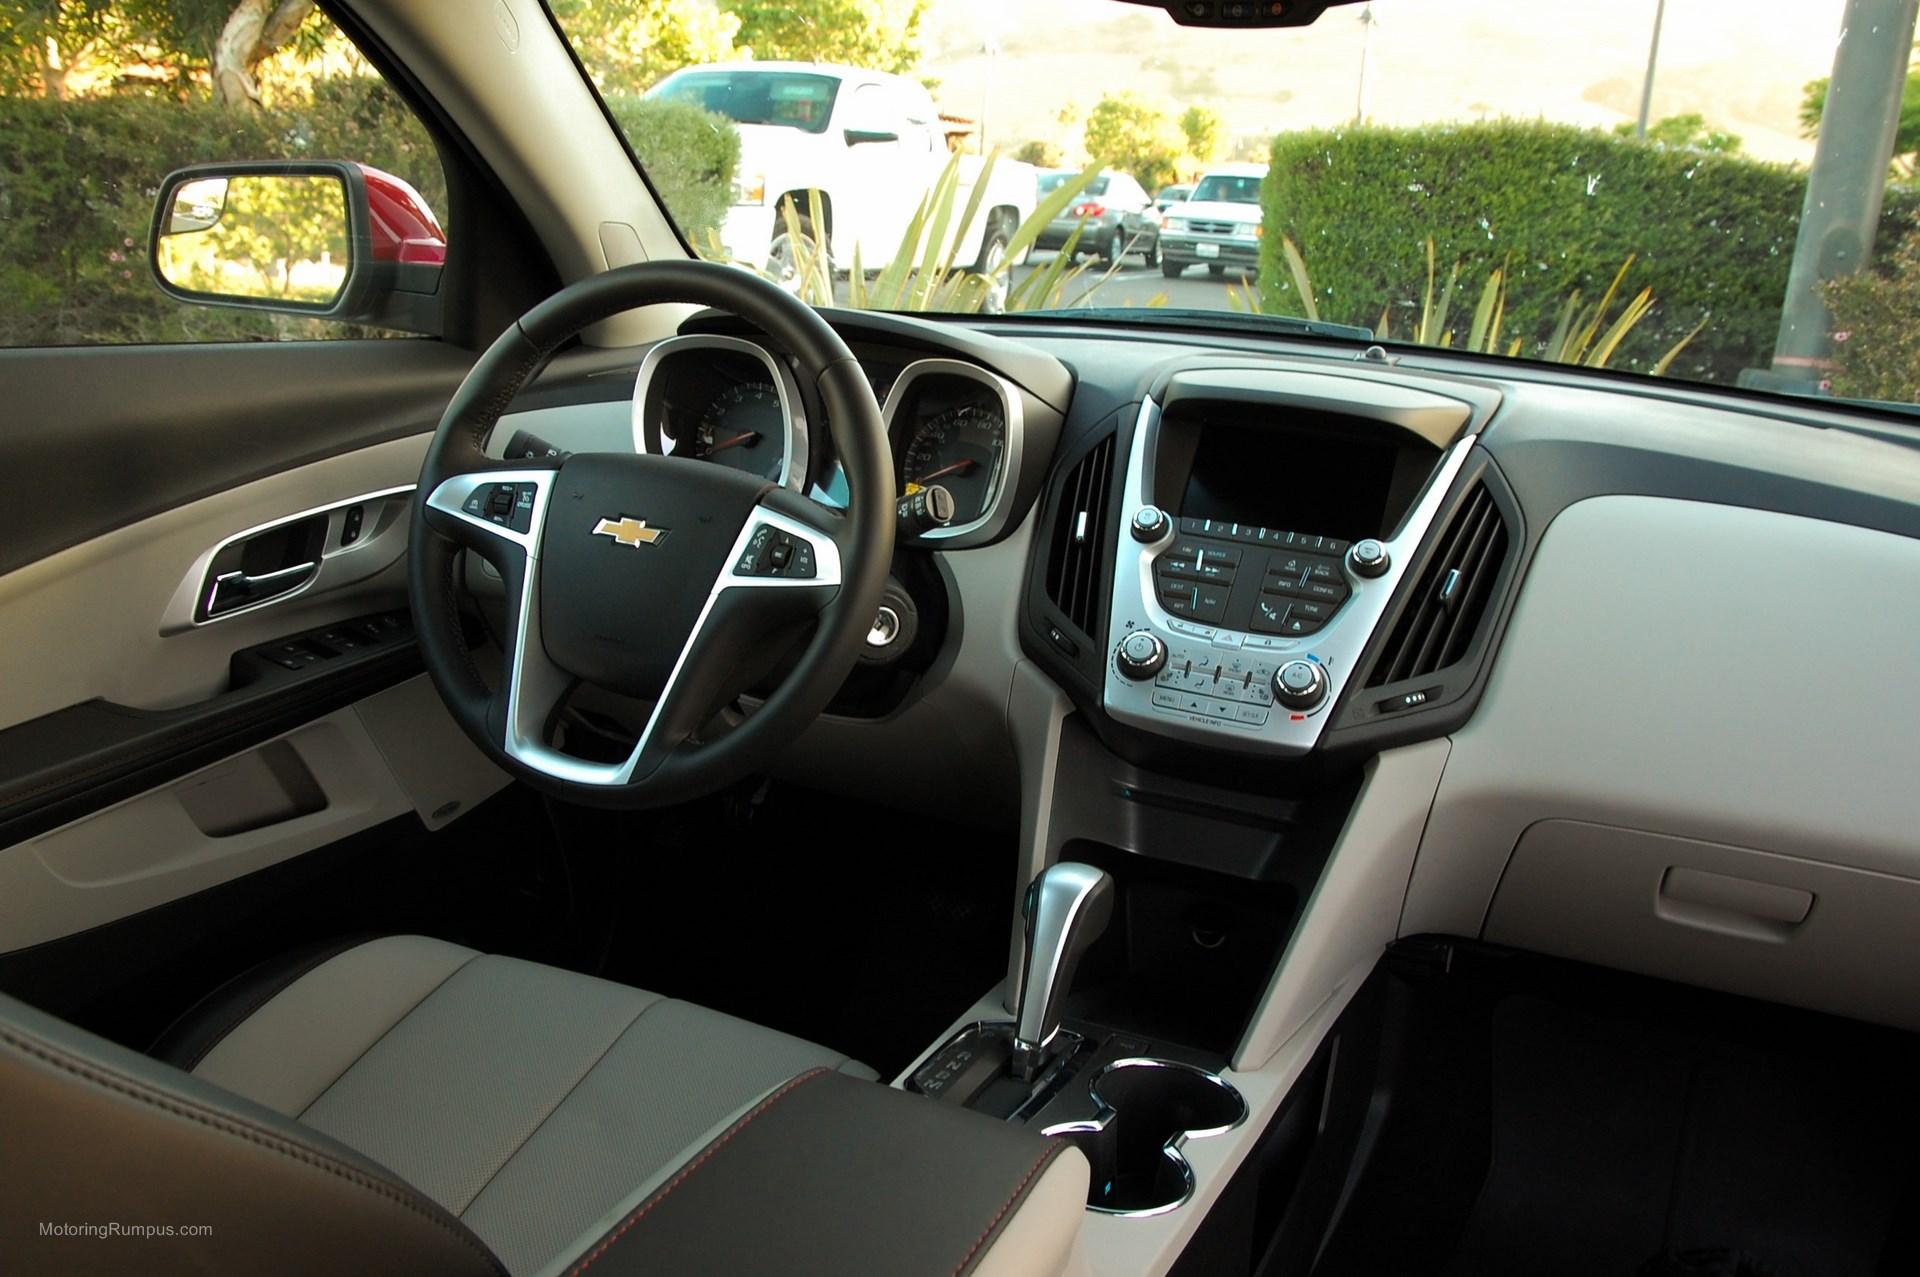 2014 Chevy Equinox LT Interior